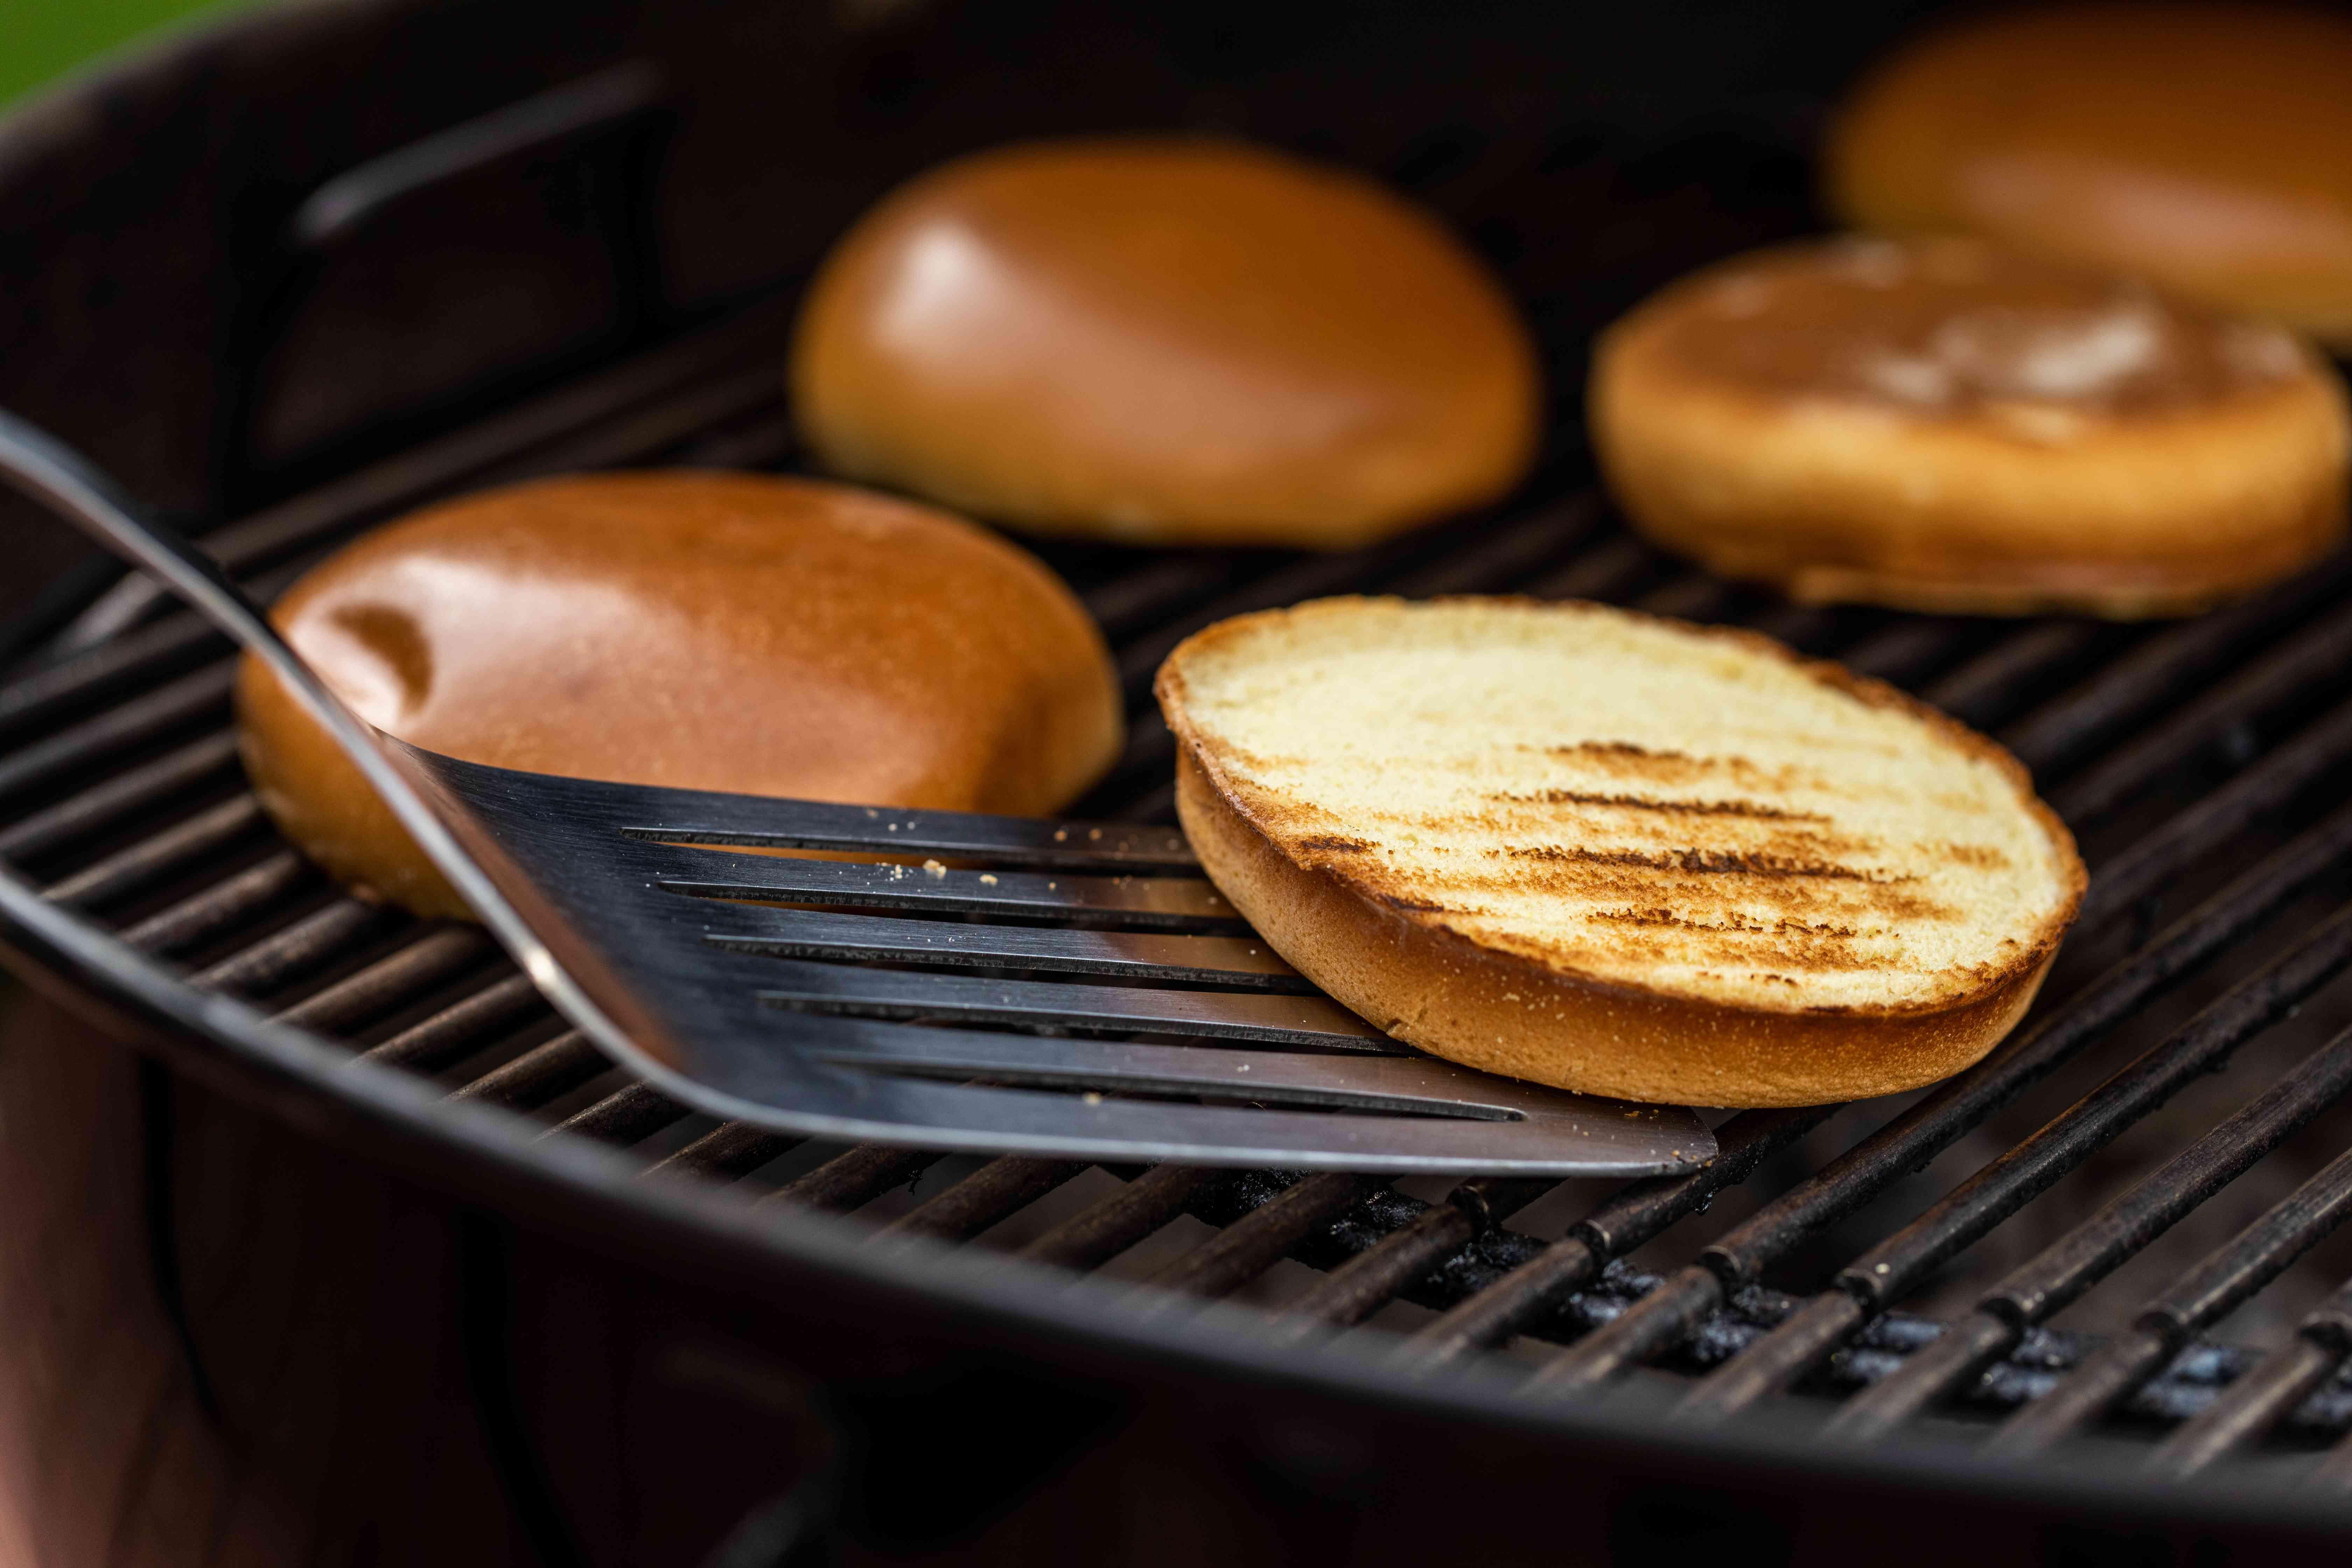 Spatula with a toasted hamburger bun on a grill.